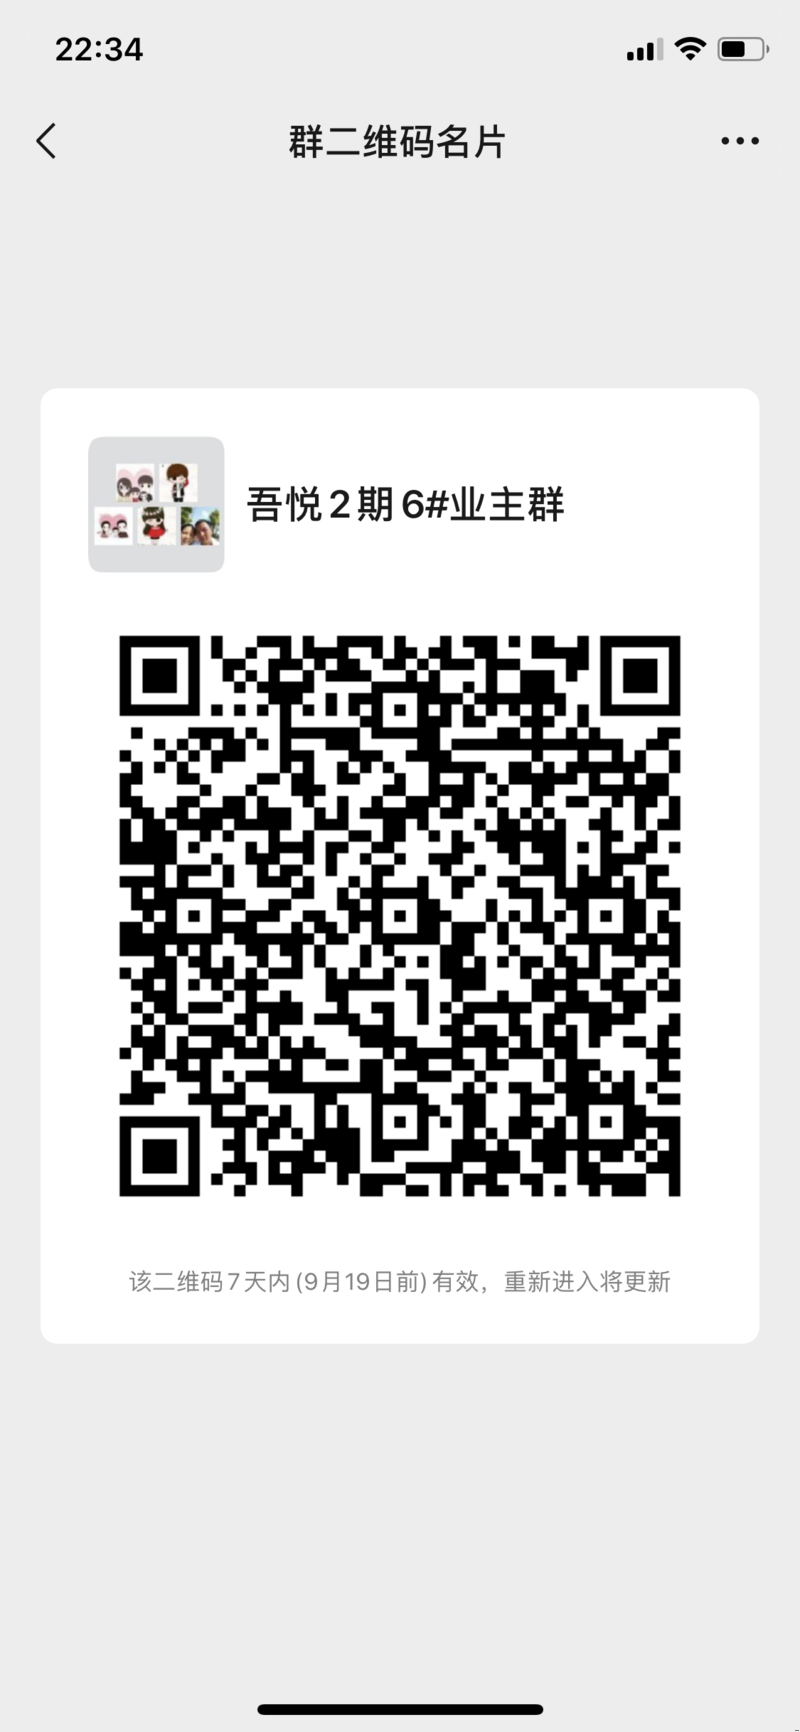 QQ图片20200912223451.png